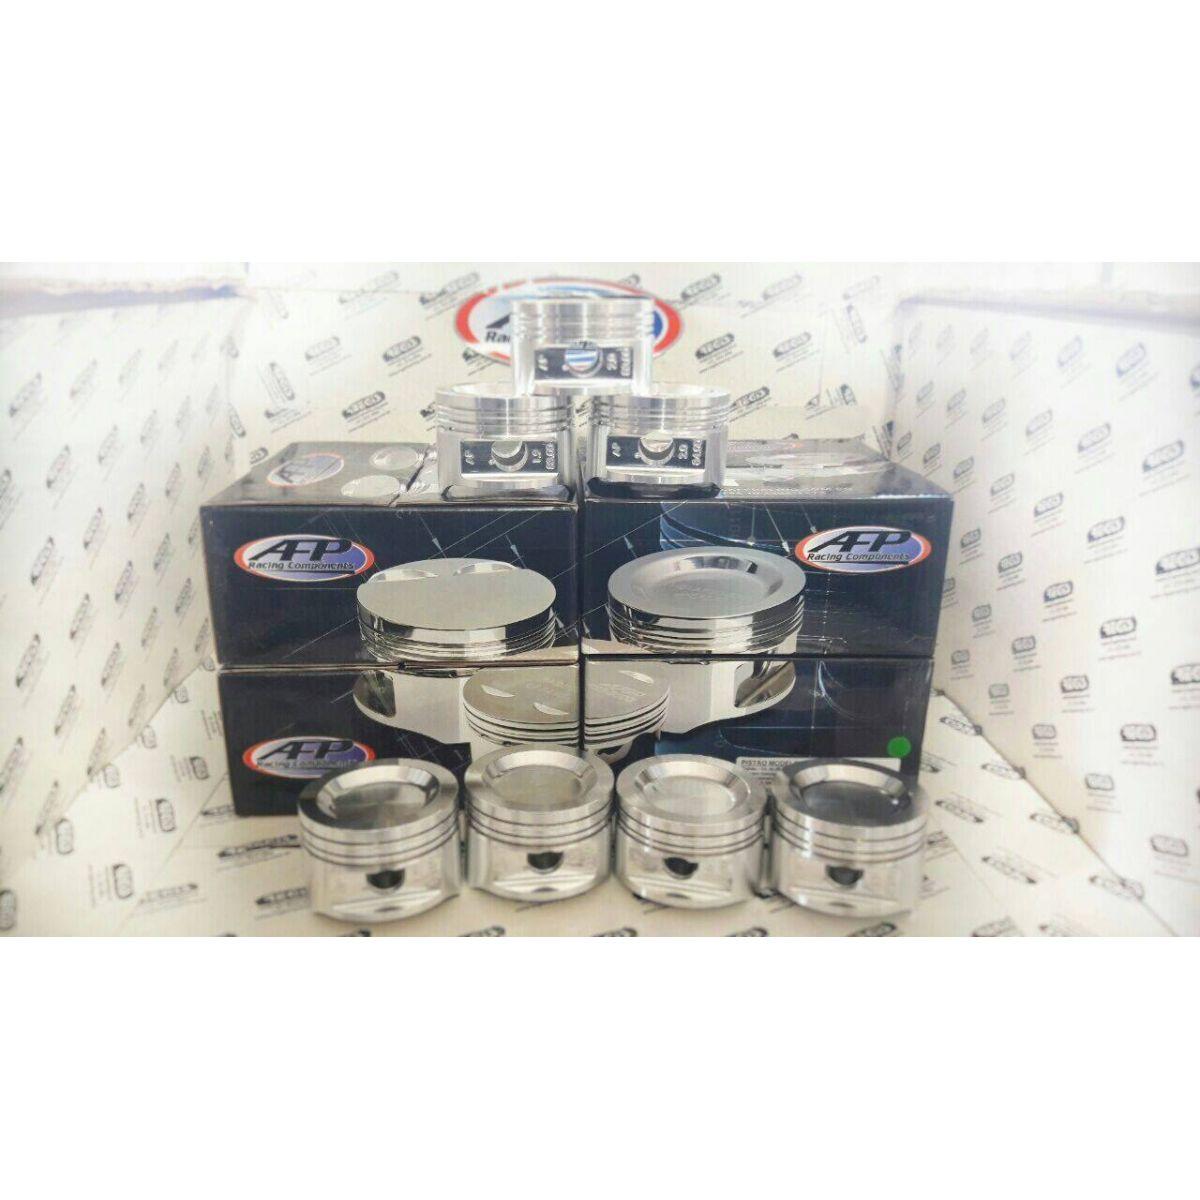 Pistao AFP Liquid Forged VW AP 2.0 83,00mm p/ 800cv